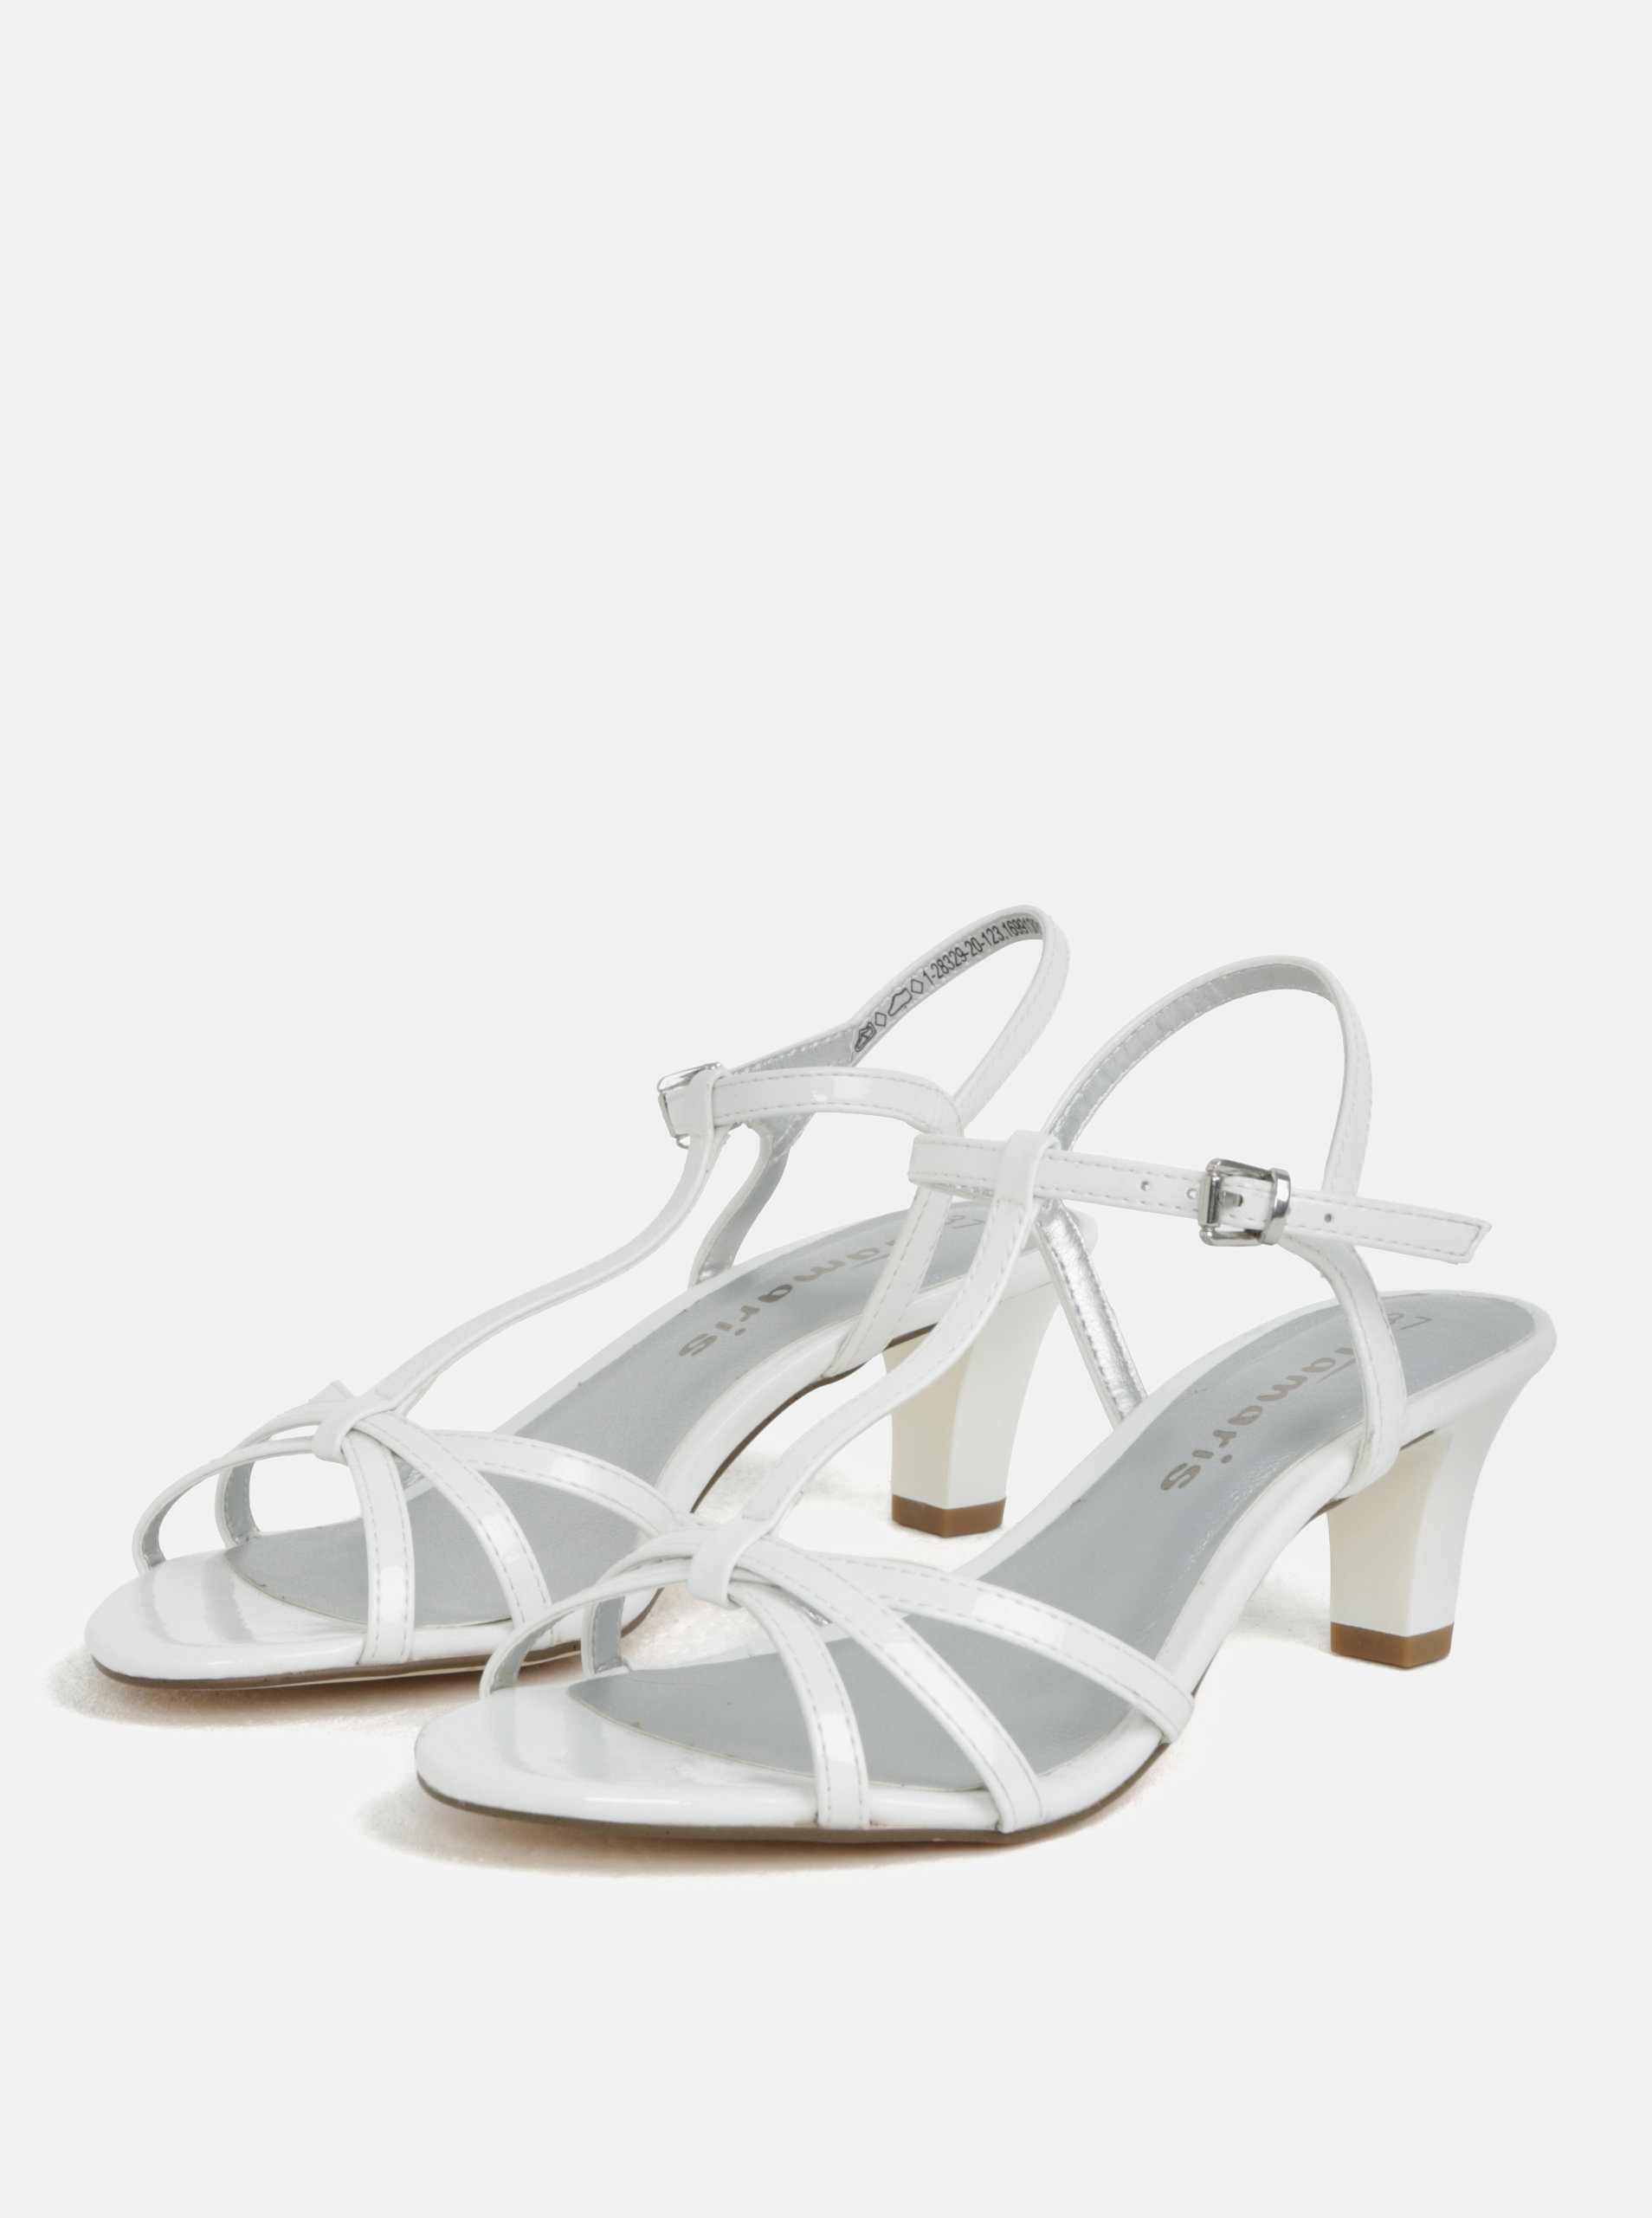 d94436eb27cd Biele sandále na nízkom podpätku Tamaris ...